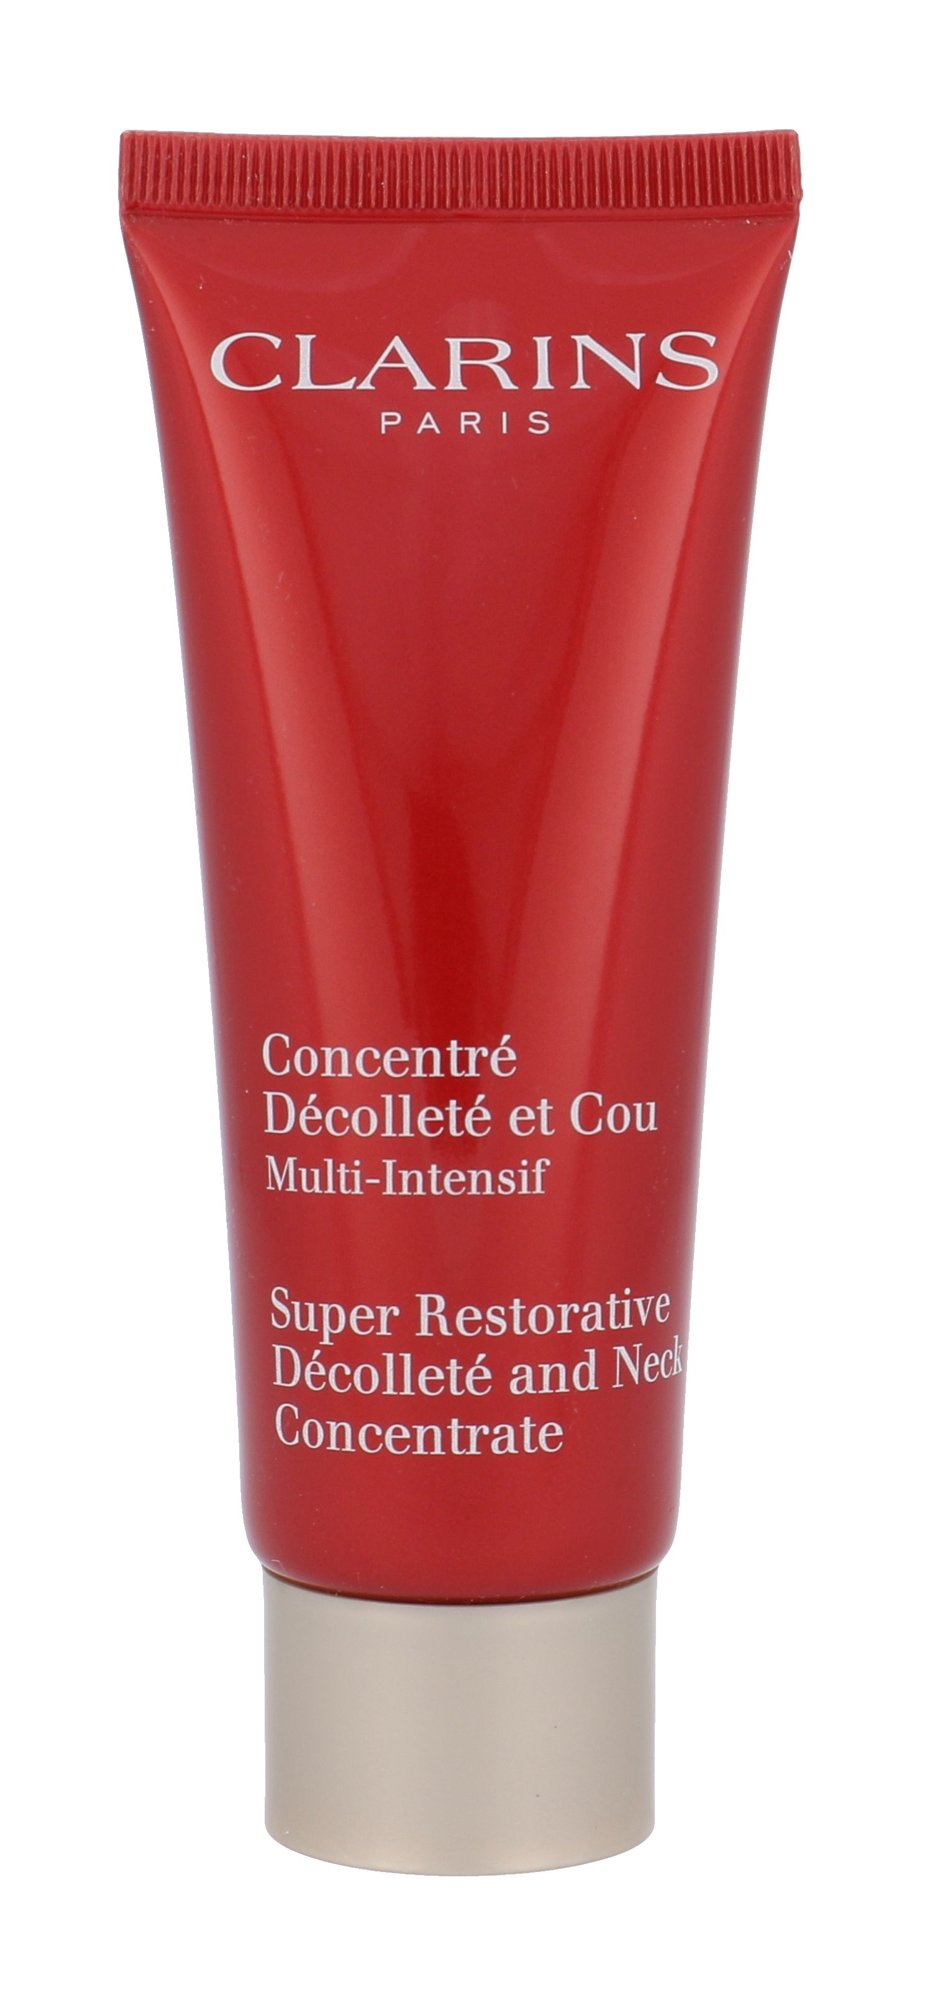 Clarins Age Replenish Cosmetic 75ml